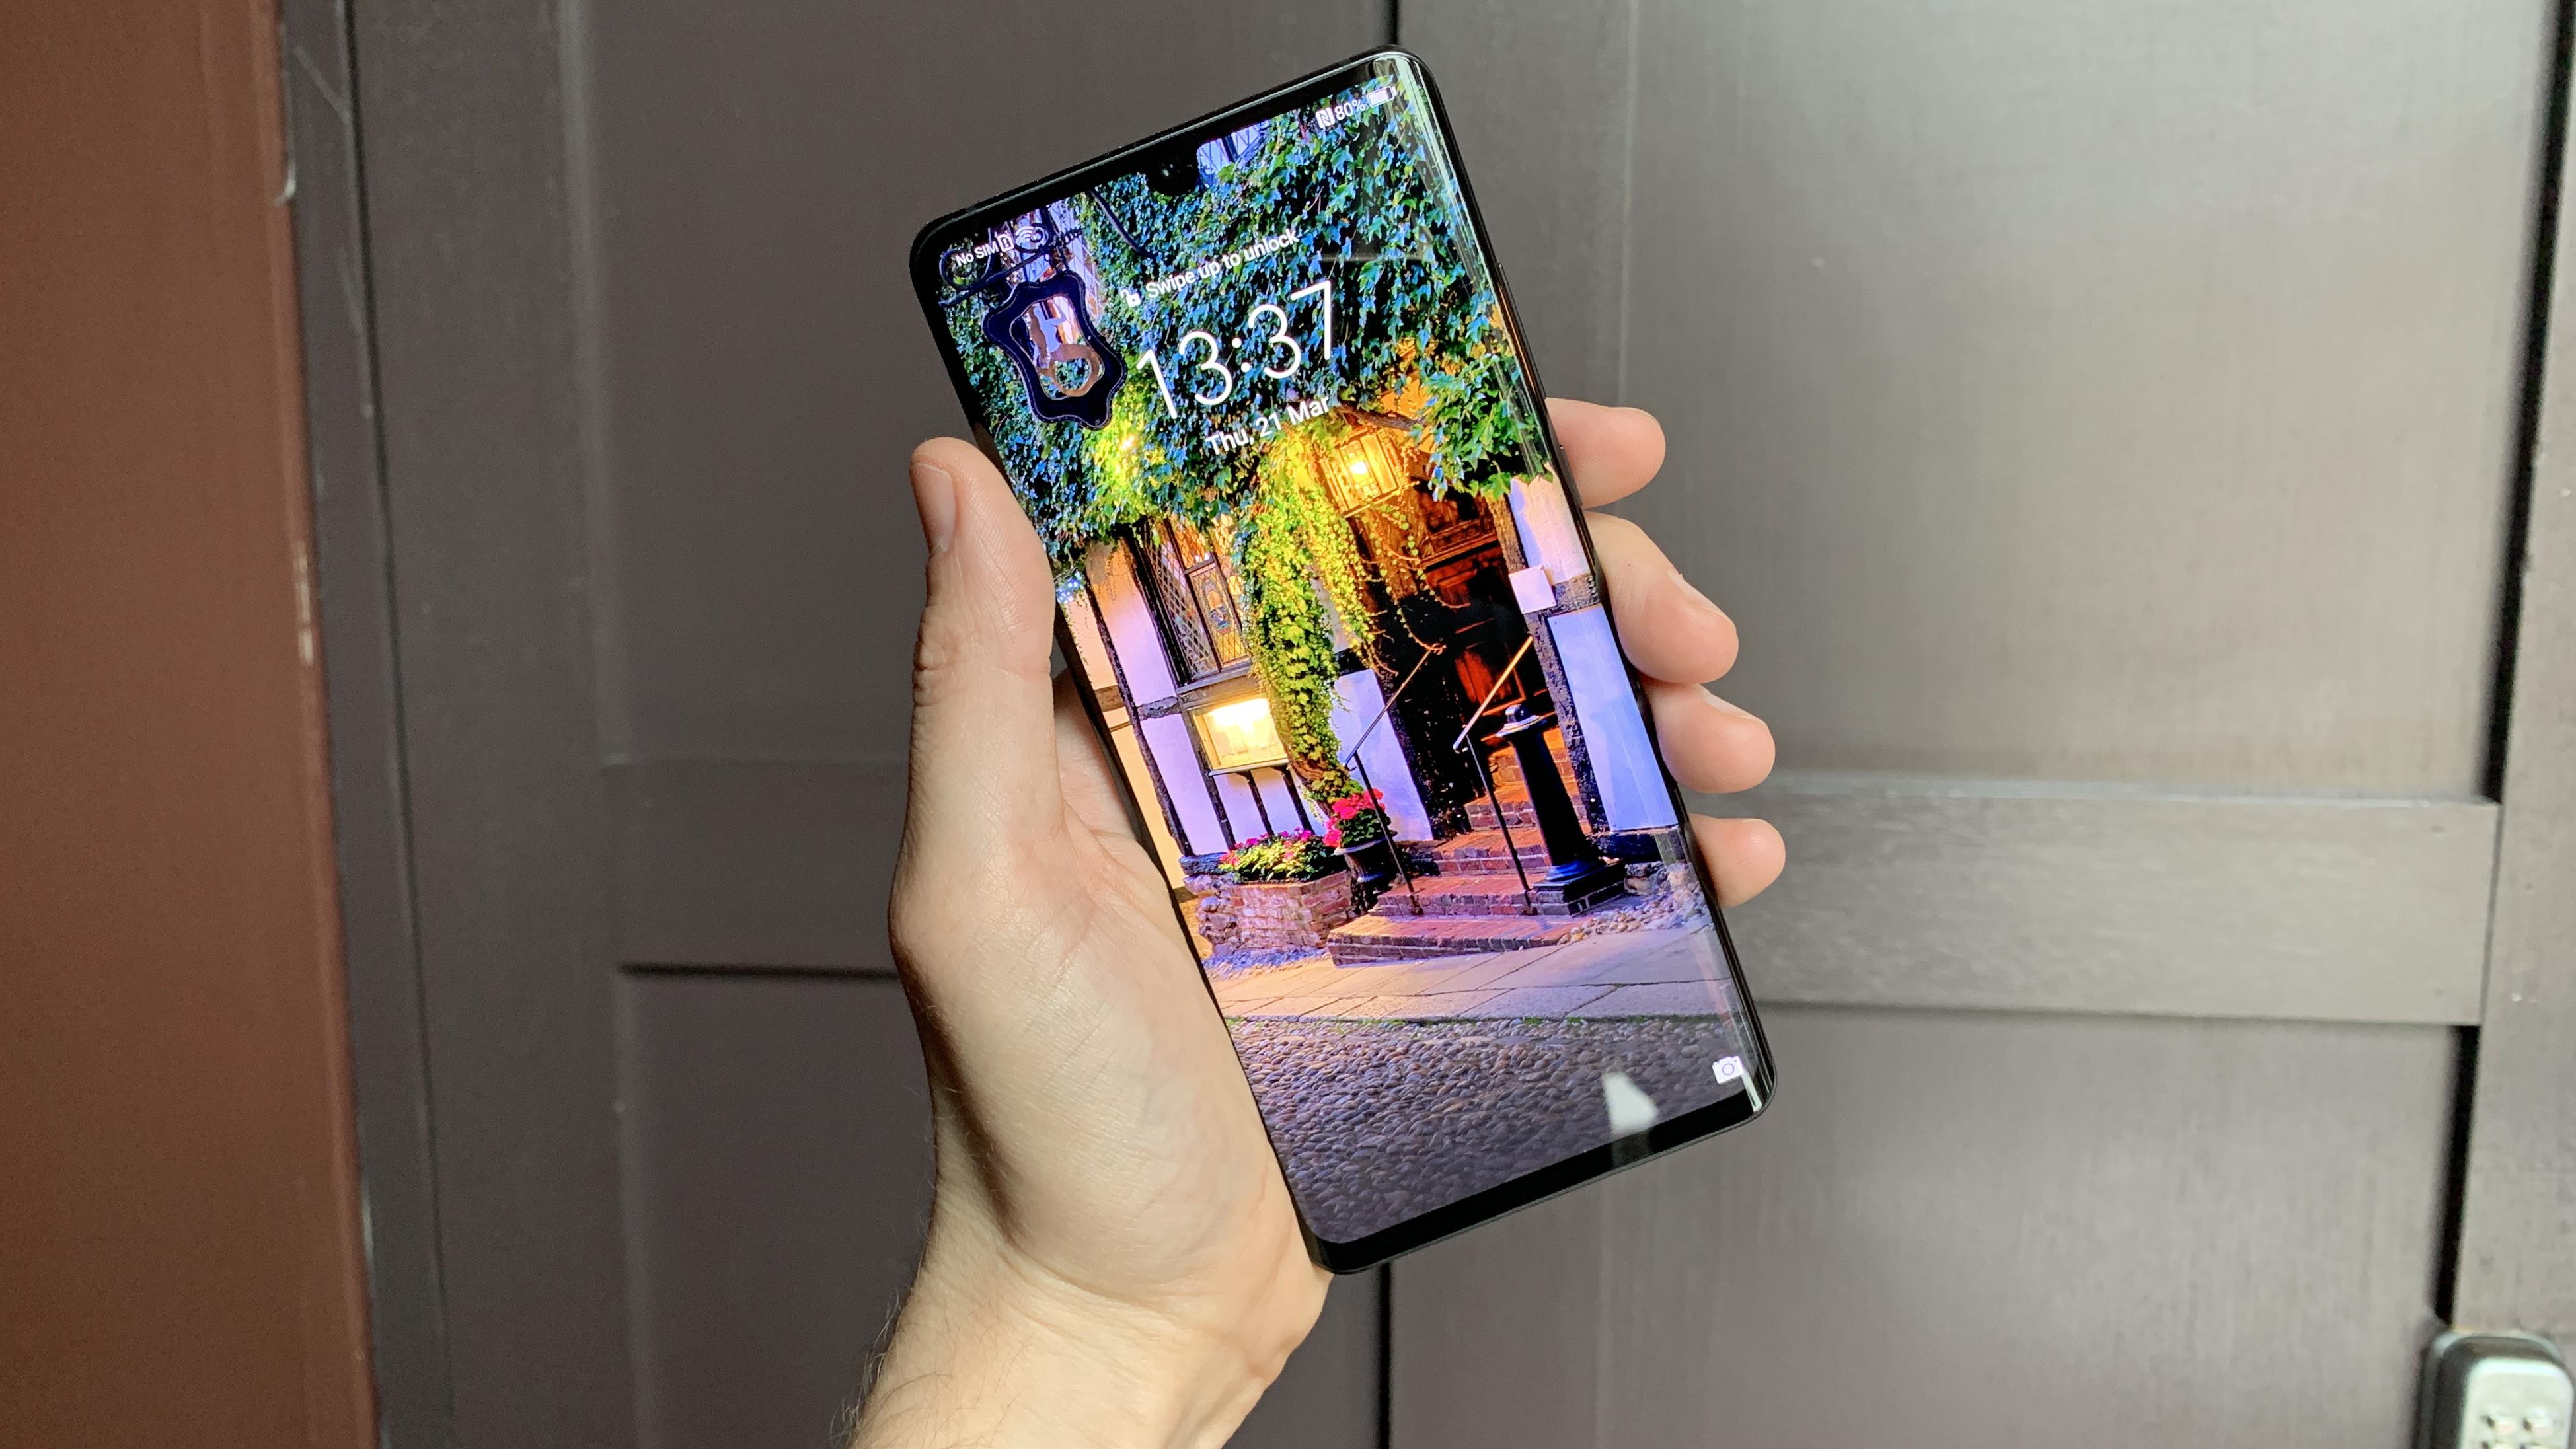 Huawei P40 Pro Plus 5G leaked hours before launch, alongside P40 Pro details